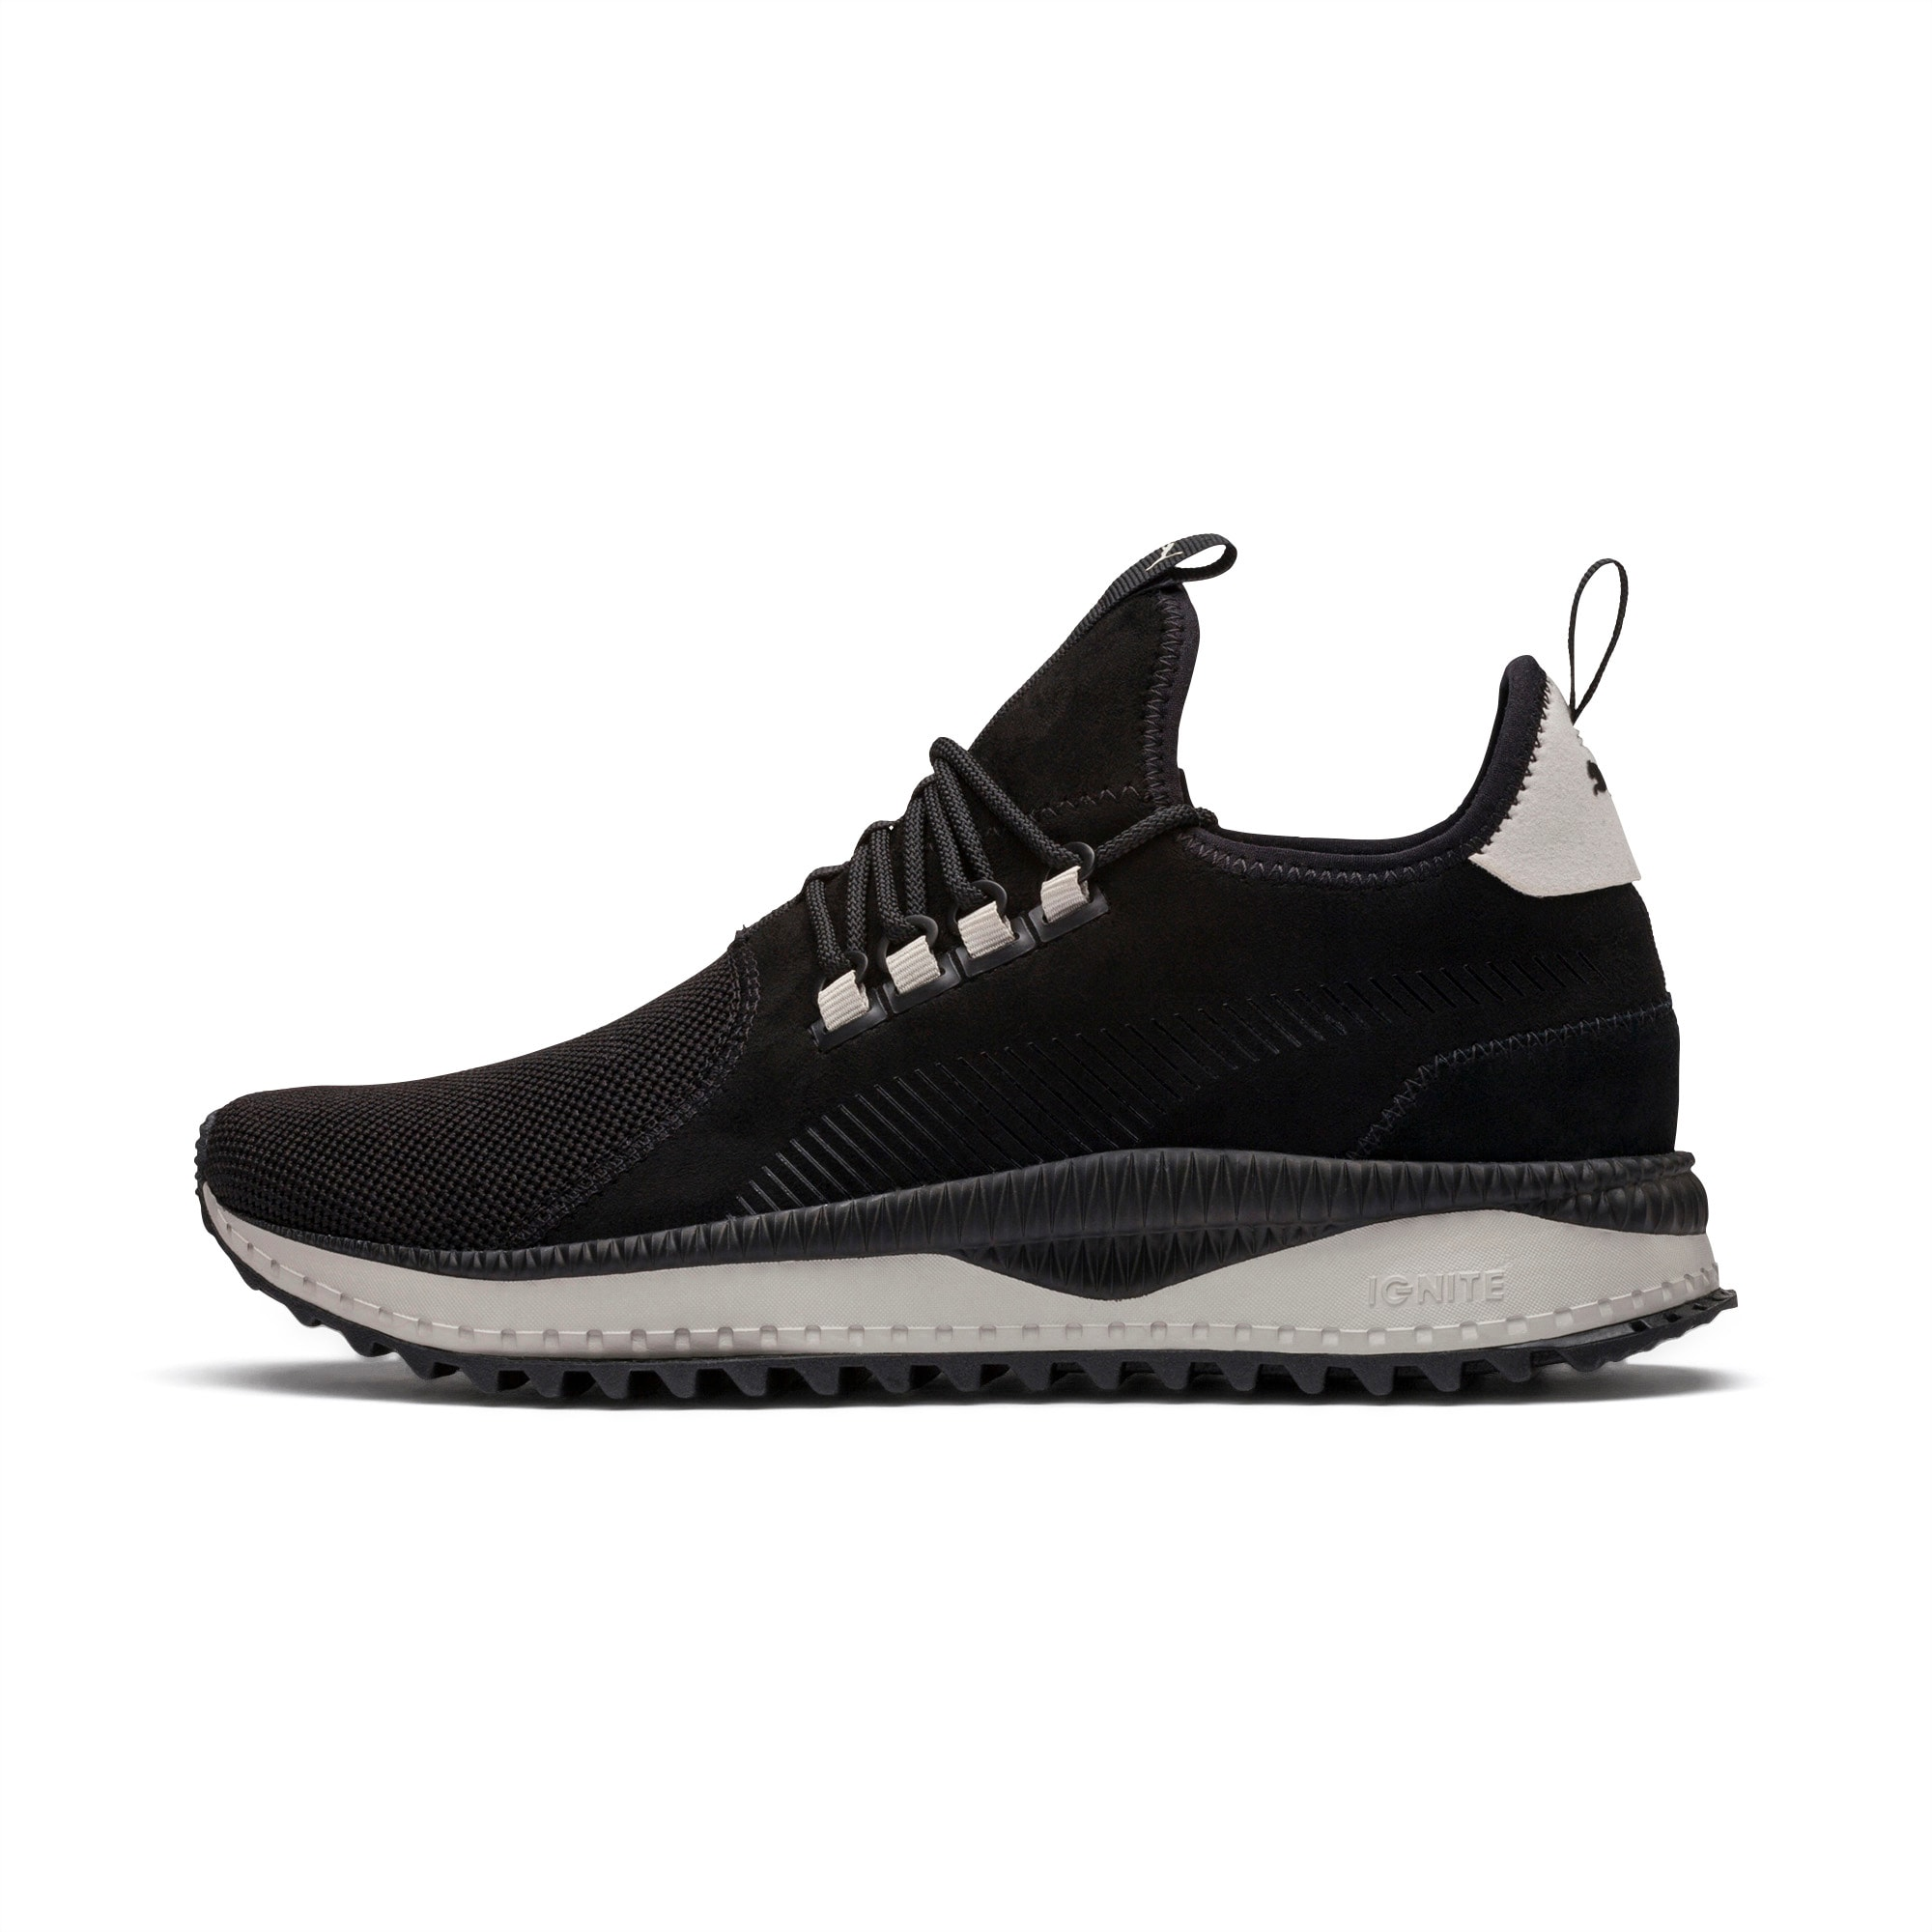 TSUGI Apex Winterized Running Shoes